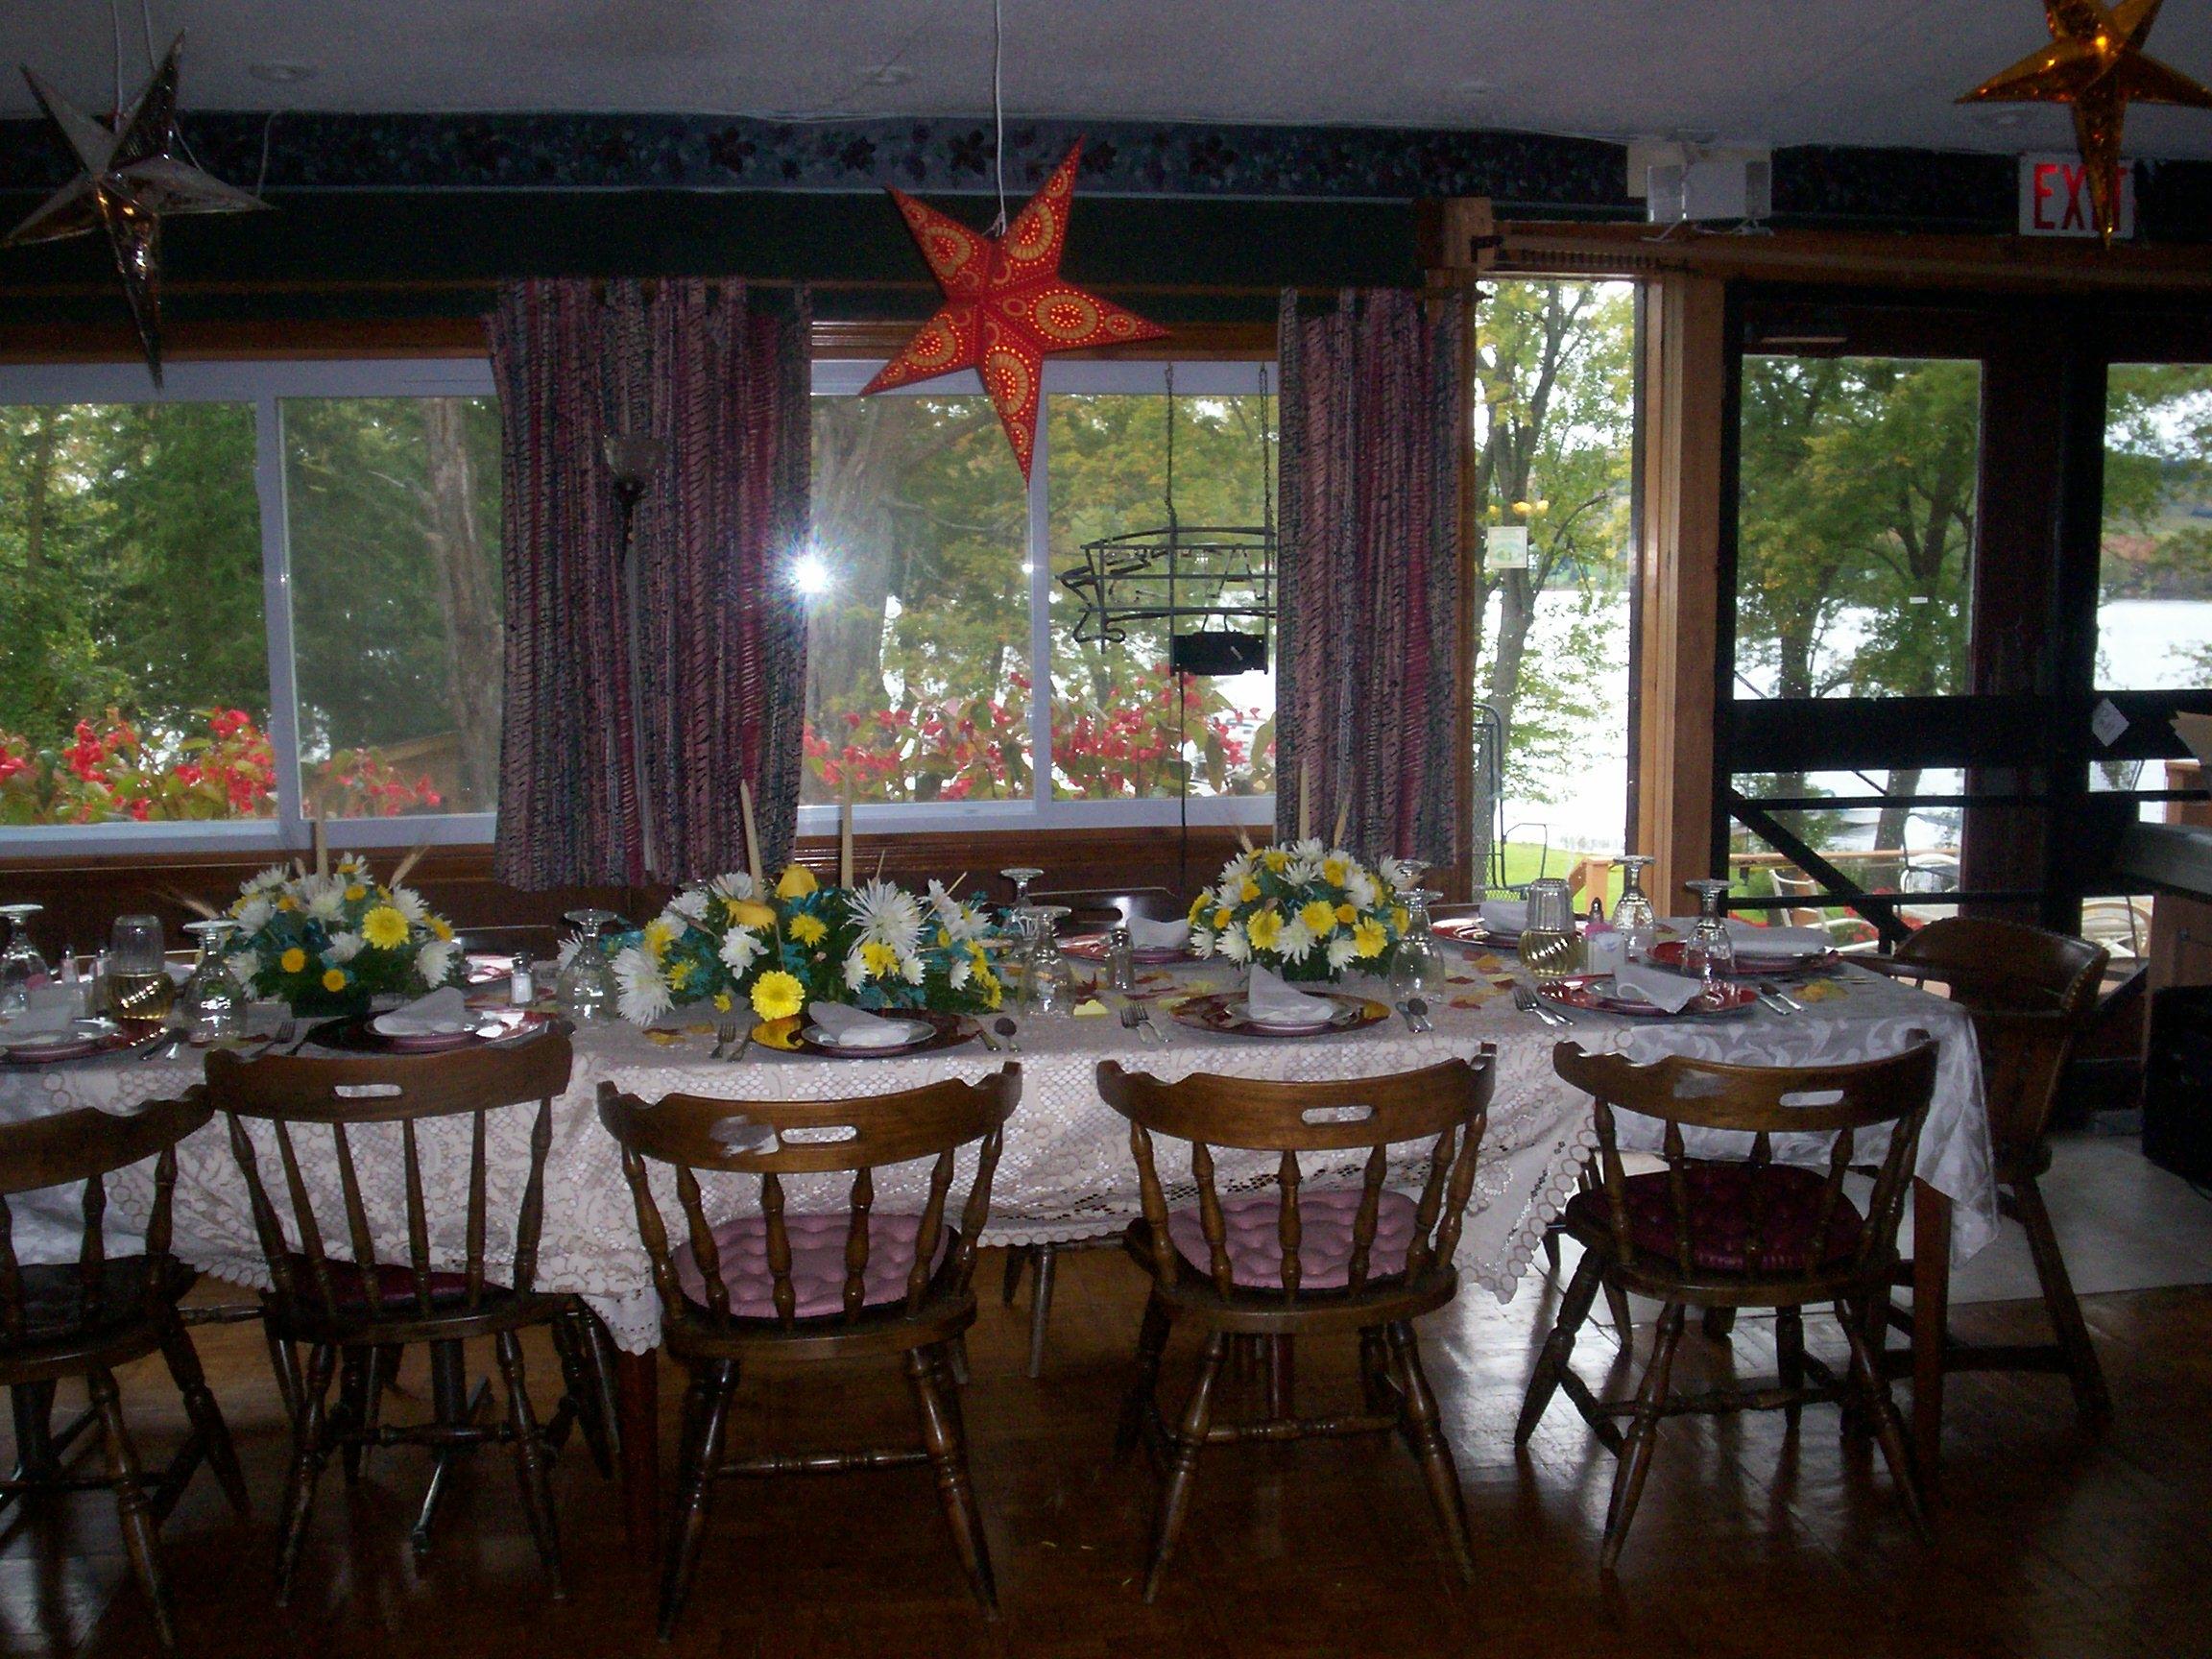 The Lake House Lodge, Restaurant & Hotel image 23